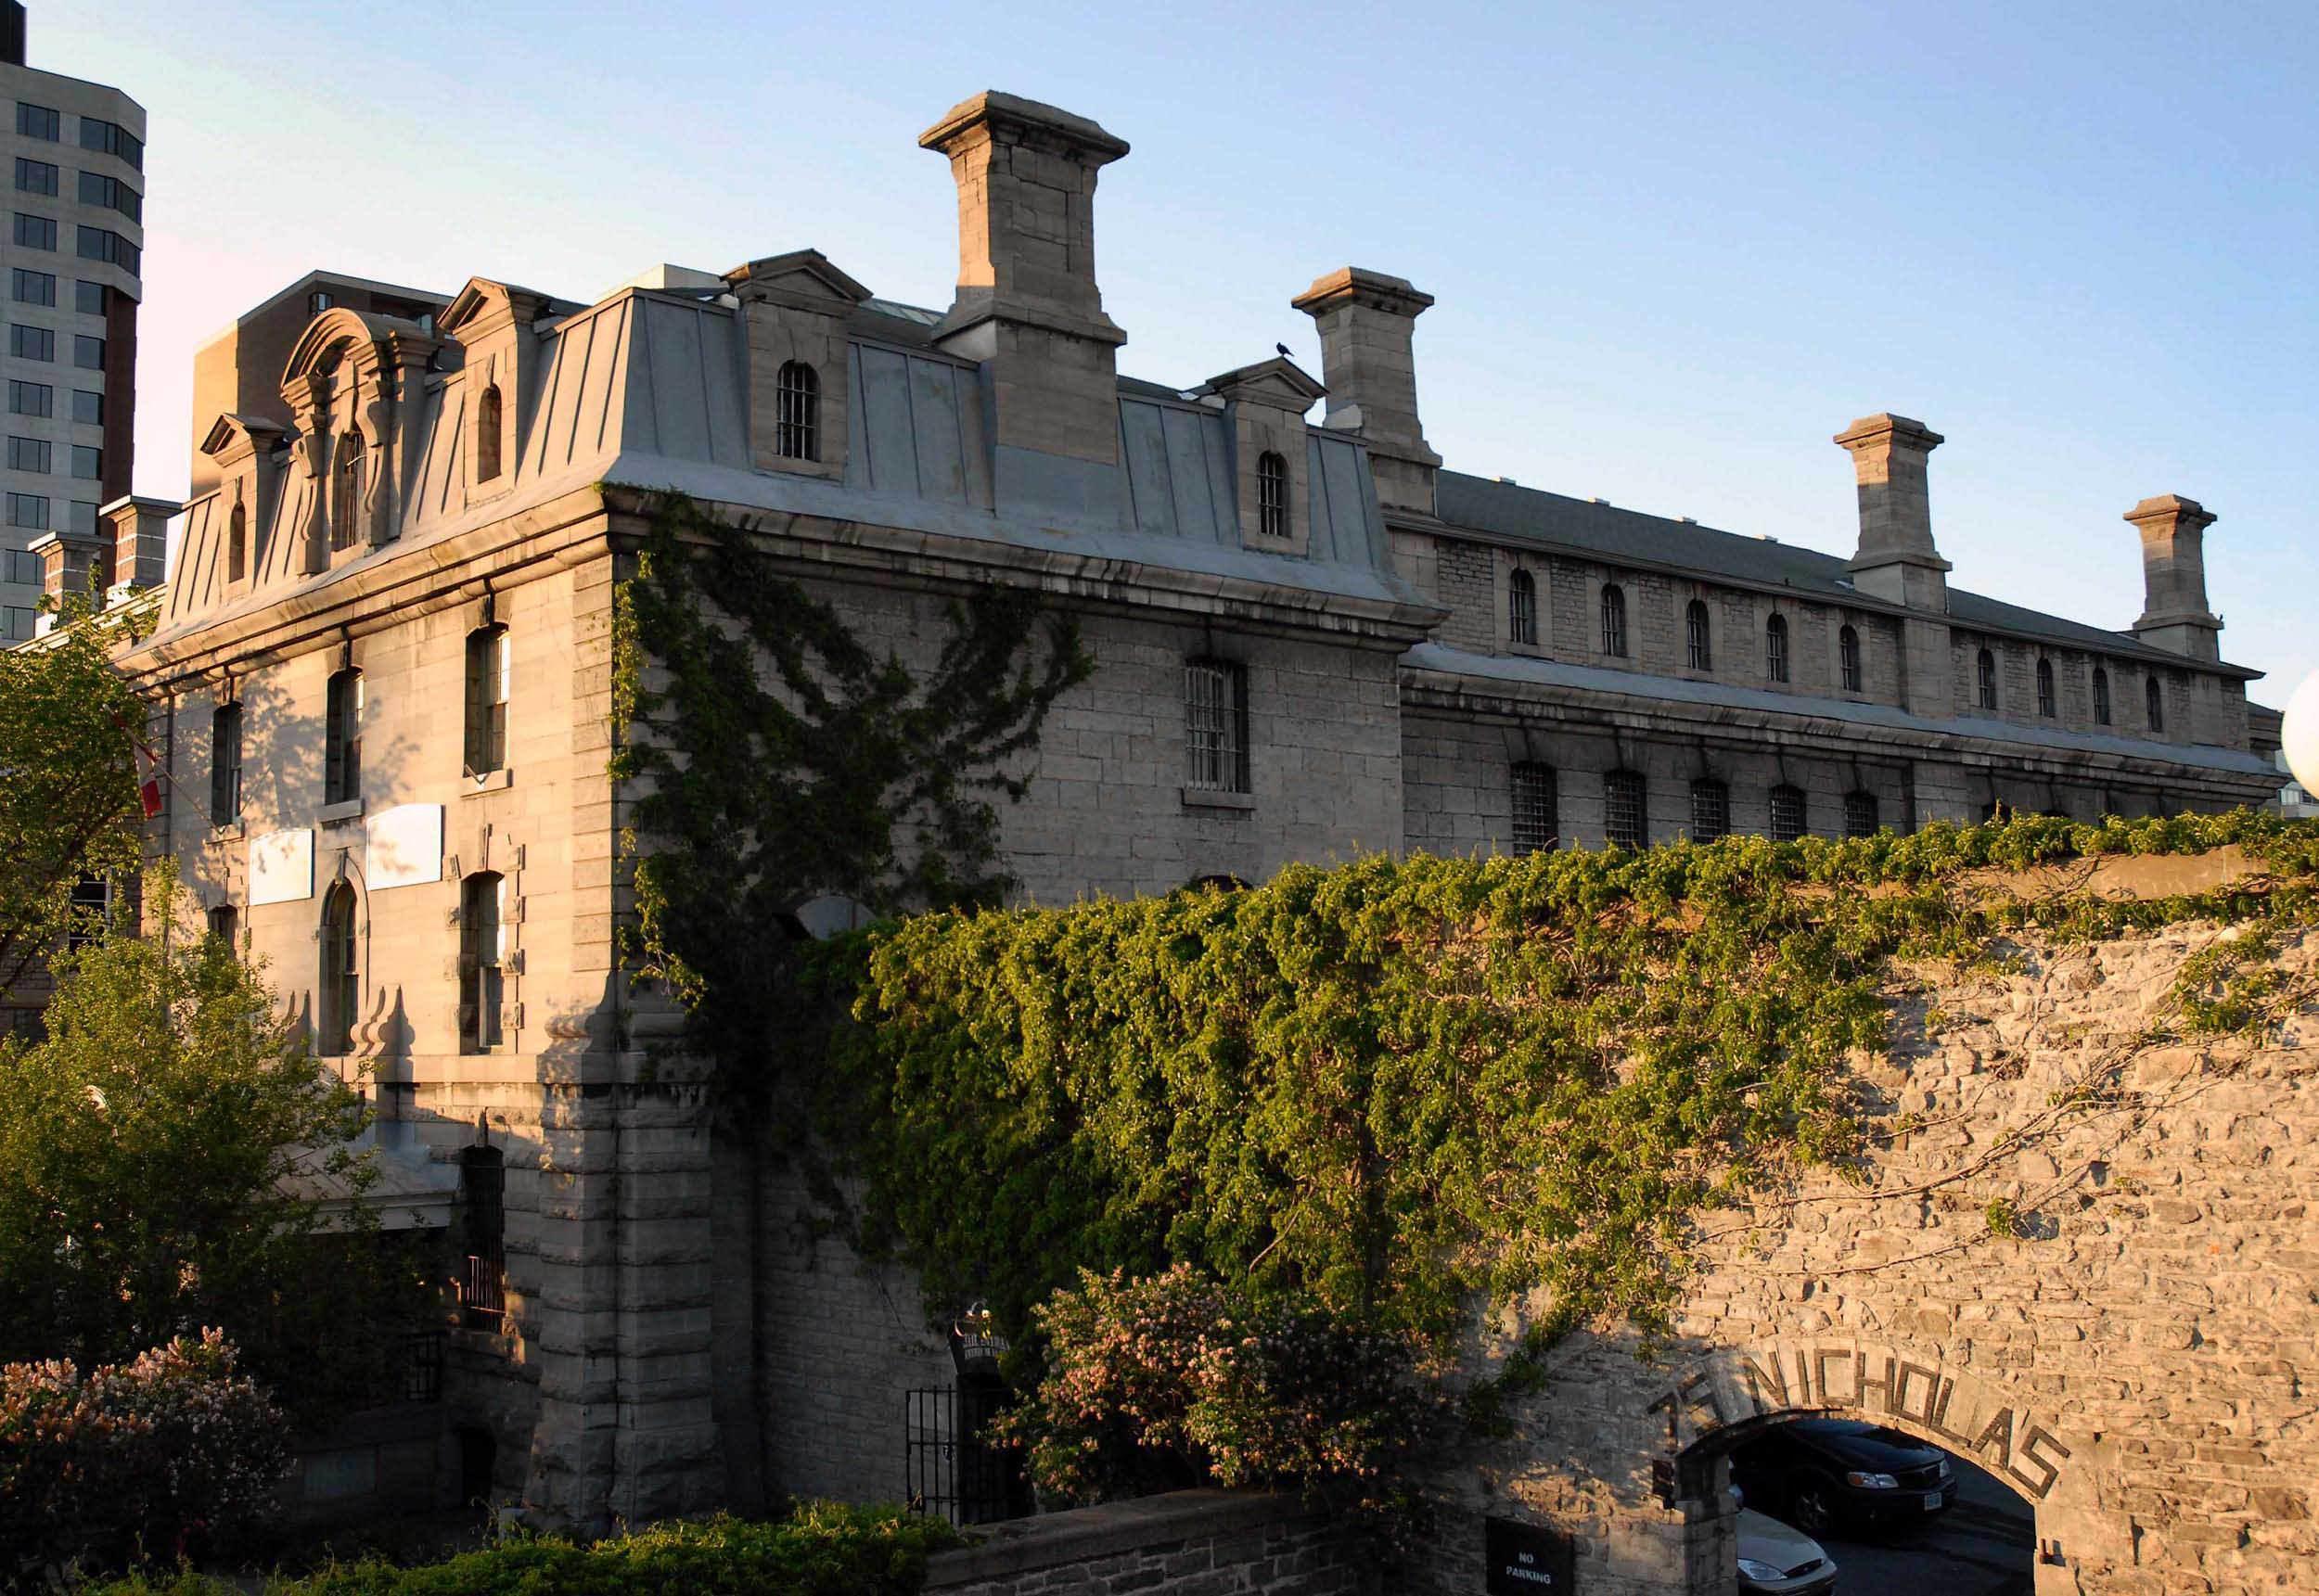 Best Bed Linen Hi Ottawa Jail Hostel Book Hostels Direct For Best Rate